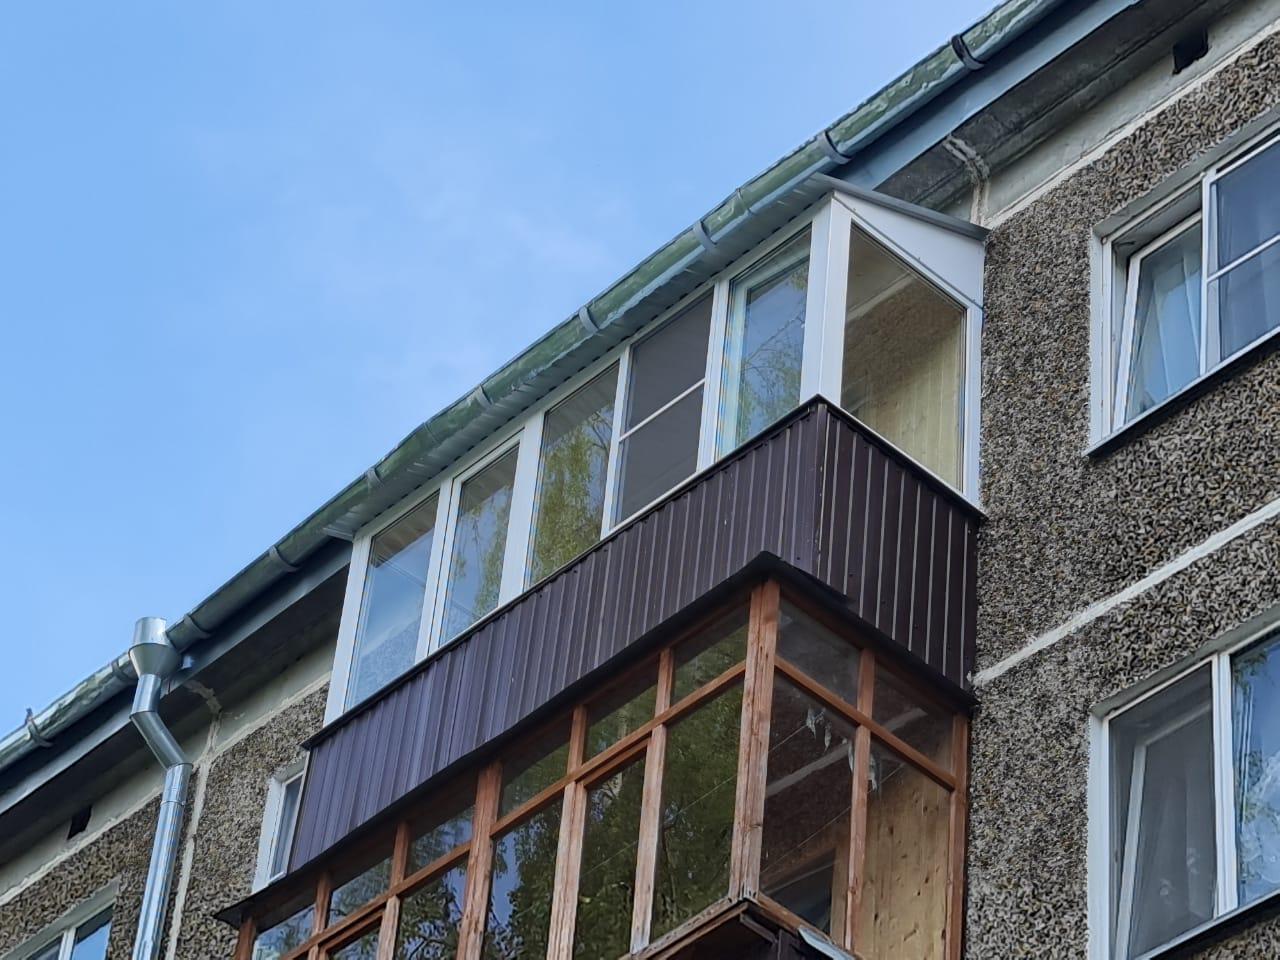 Демонтаж, монтаж и утепление балкона Ямашева 28 - фото